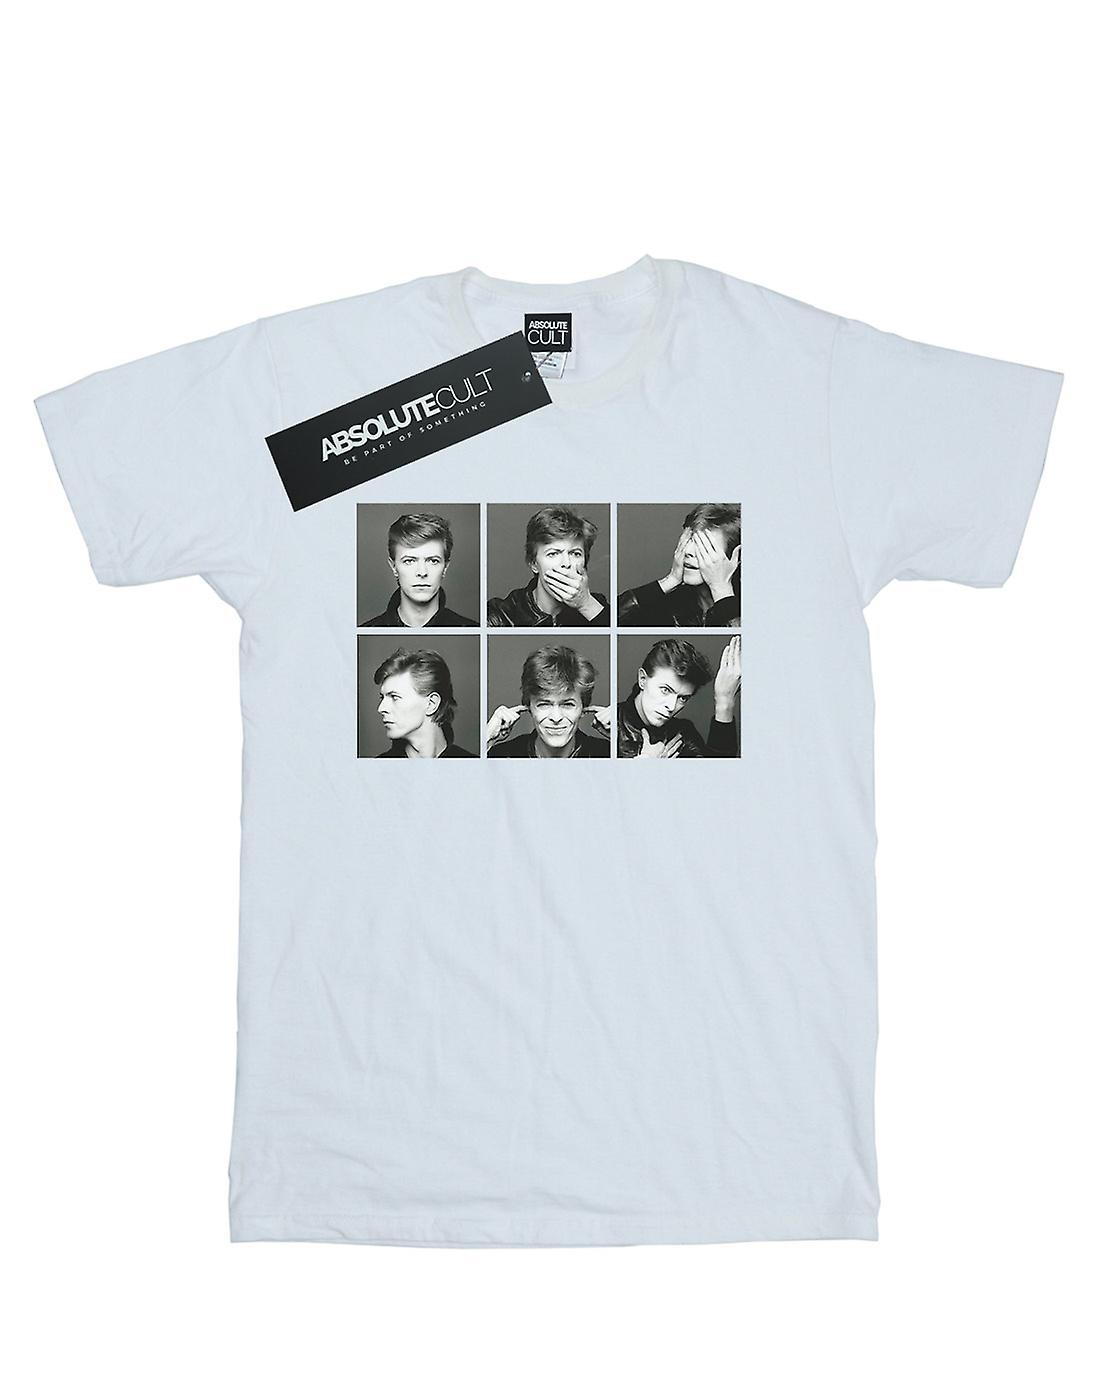 David Bowie Girls Photo Collage T-Shirt